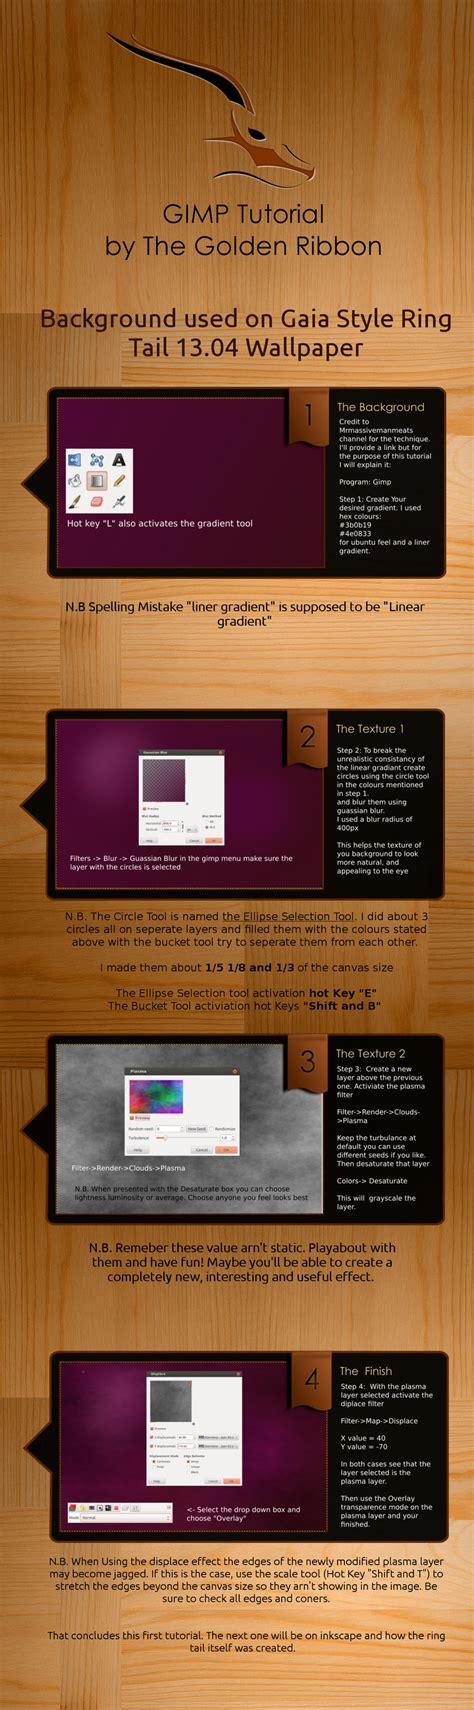 newsprint effect basics gimp by tgfcoder on deviantart gimp tutorial ring tail background by golden ribbon on